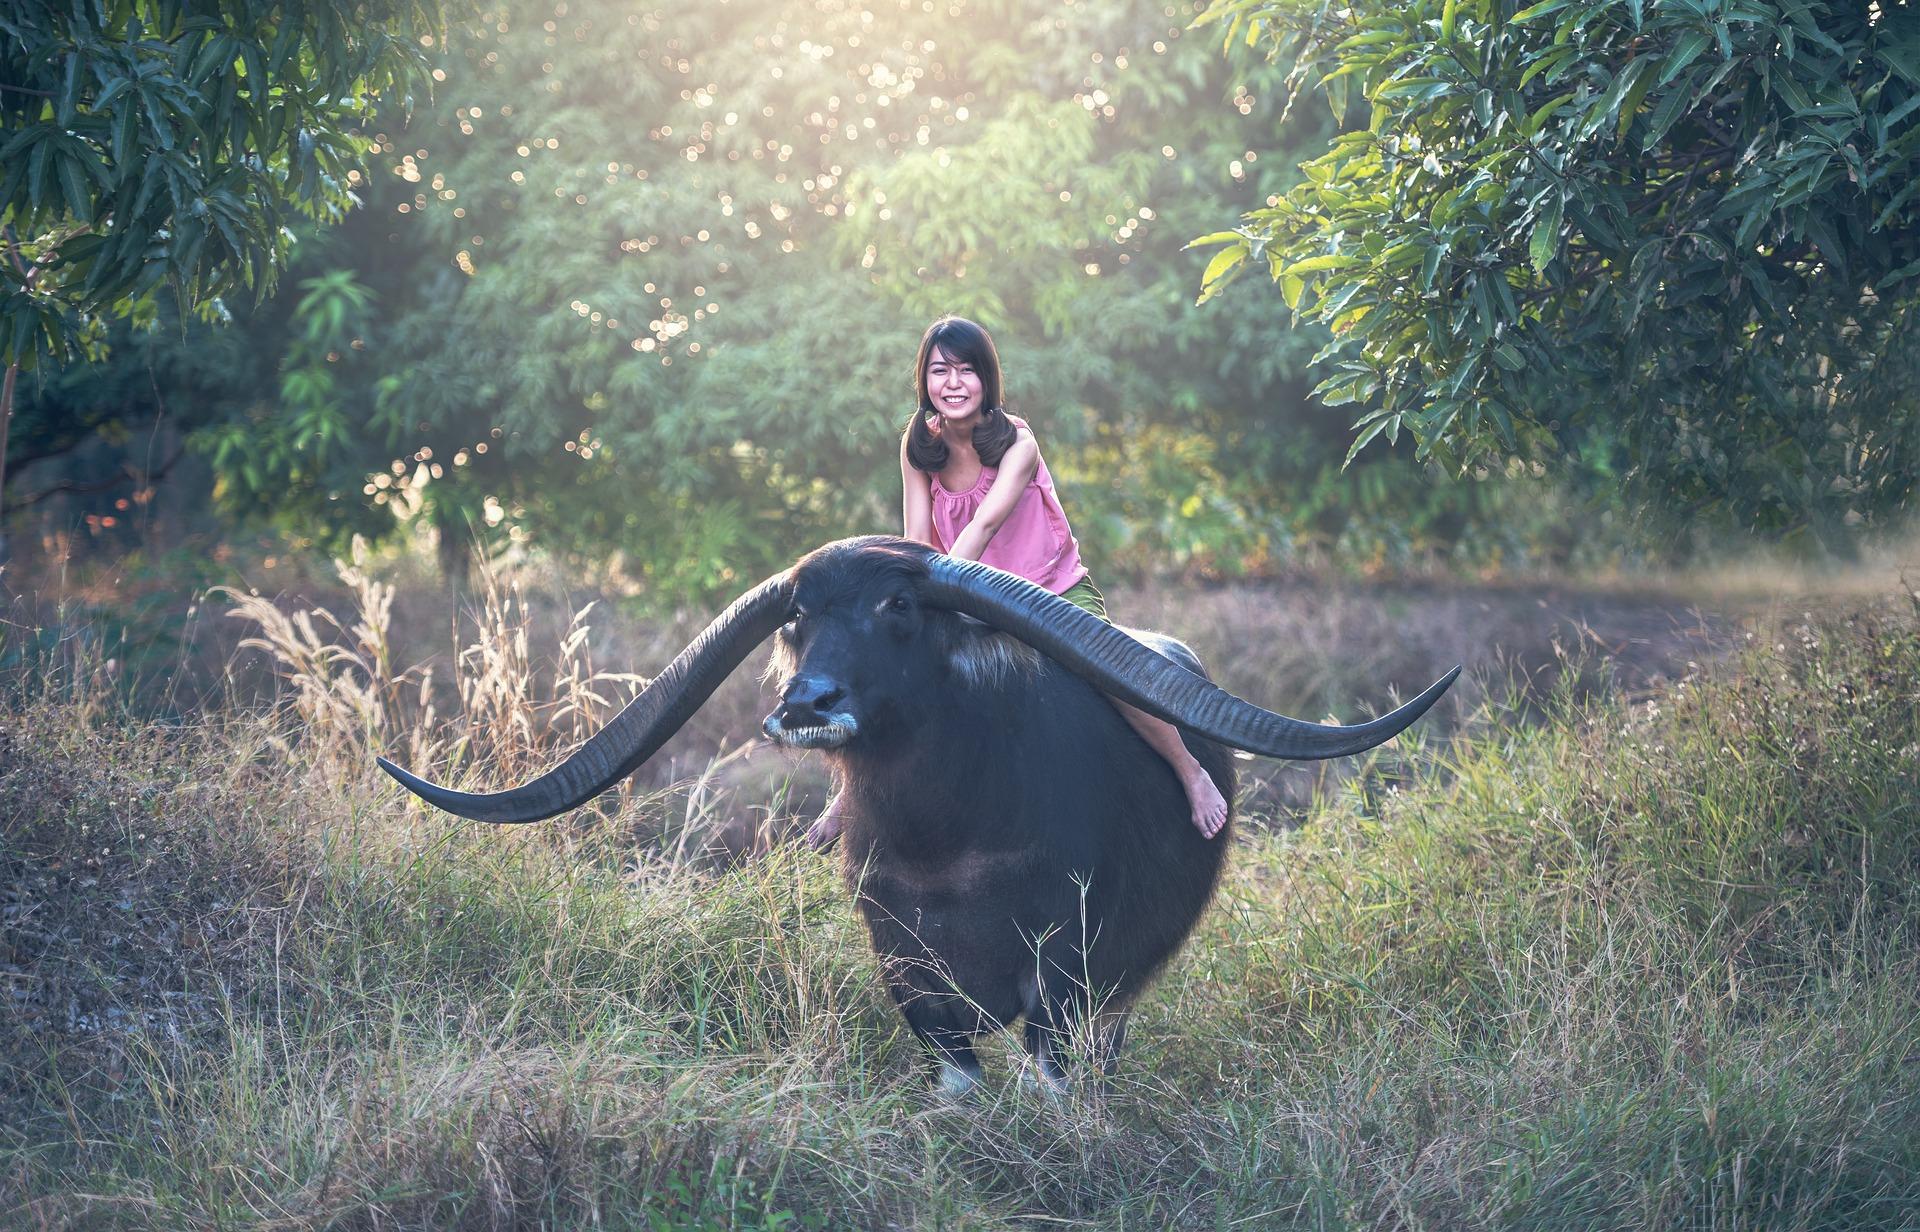 Buffalo Ride, Activity, Animal, Buffalo, Girl, HQ Photo